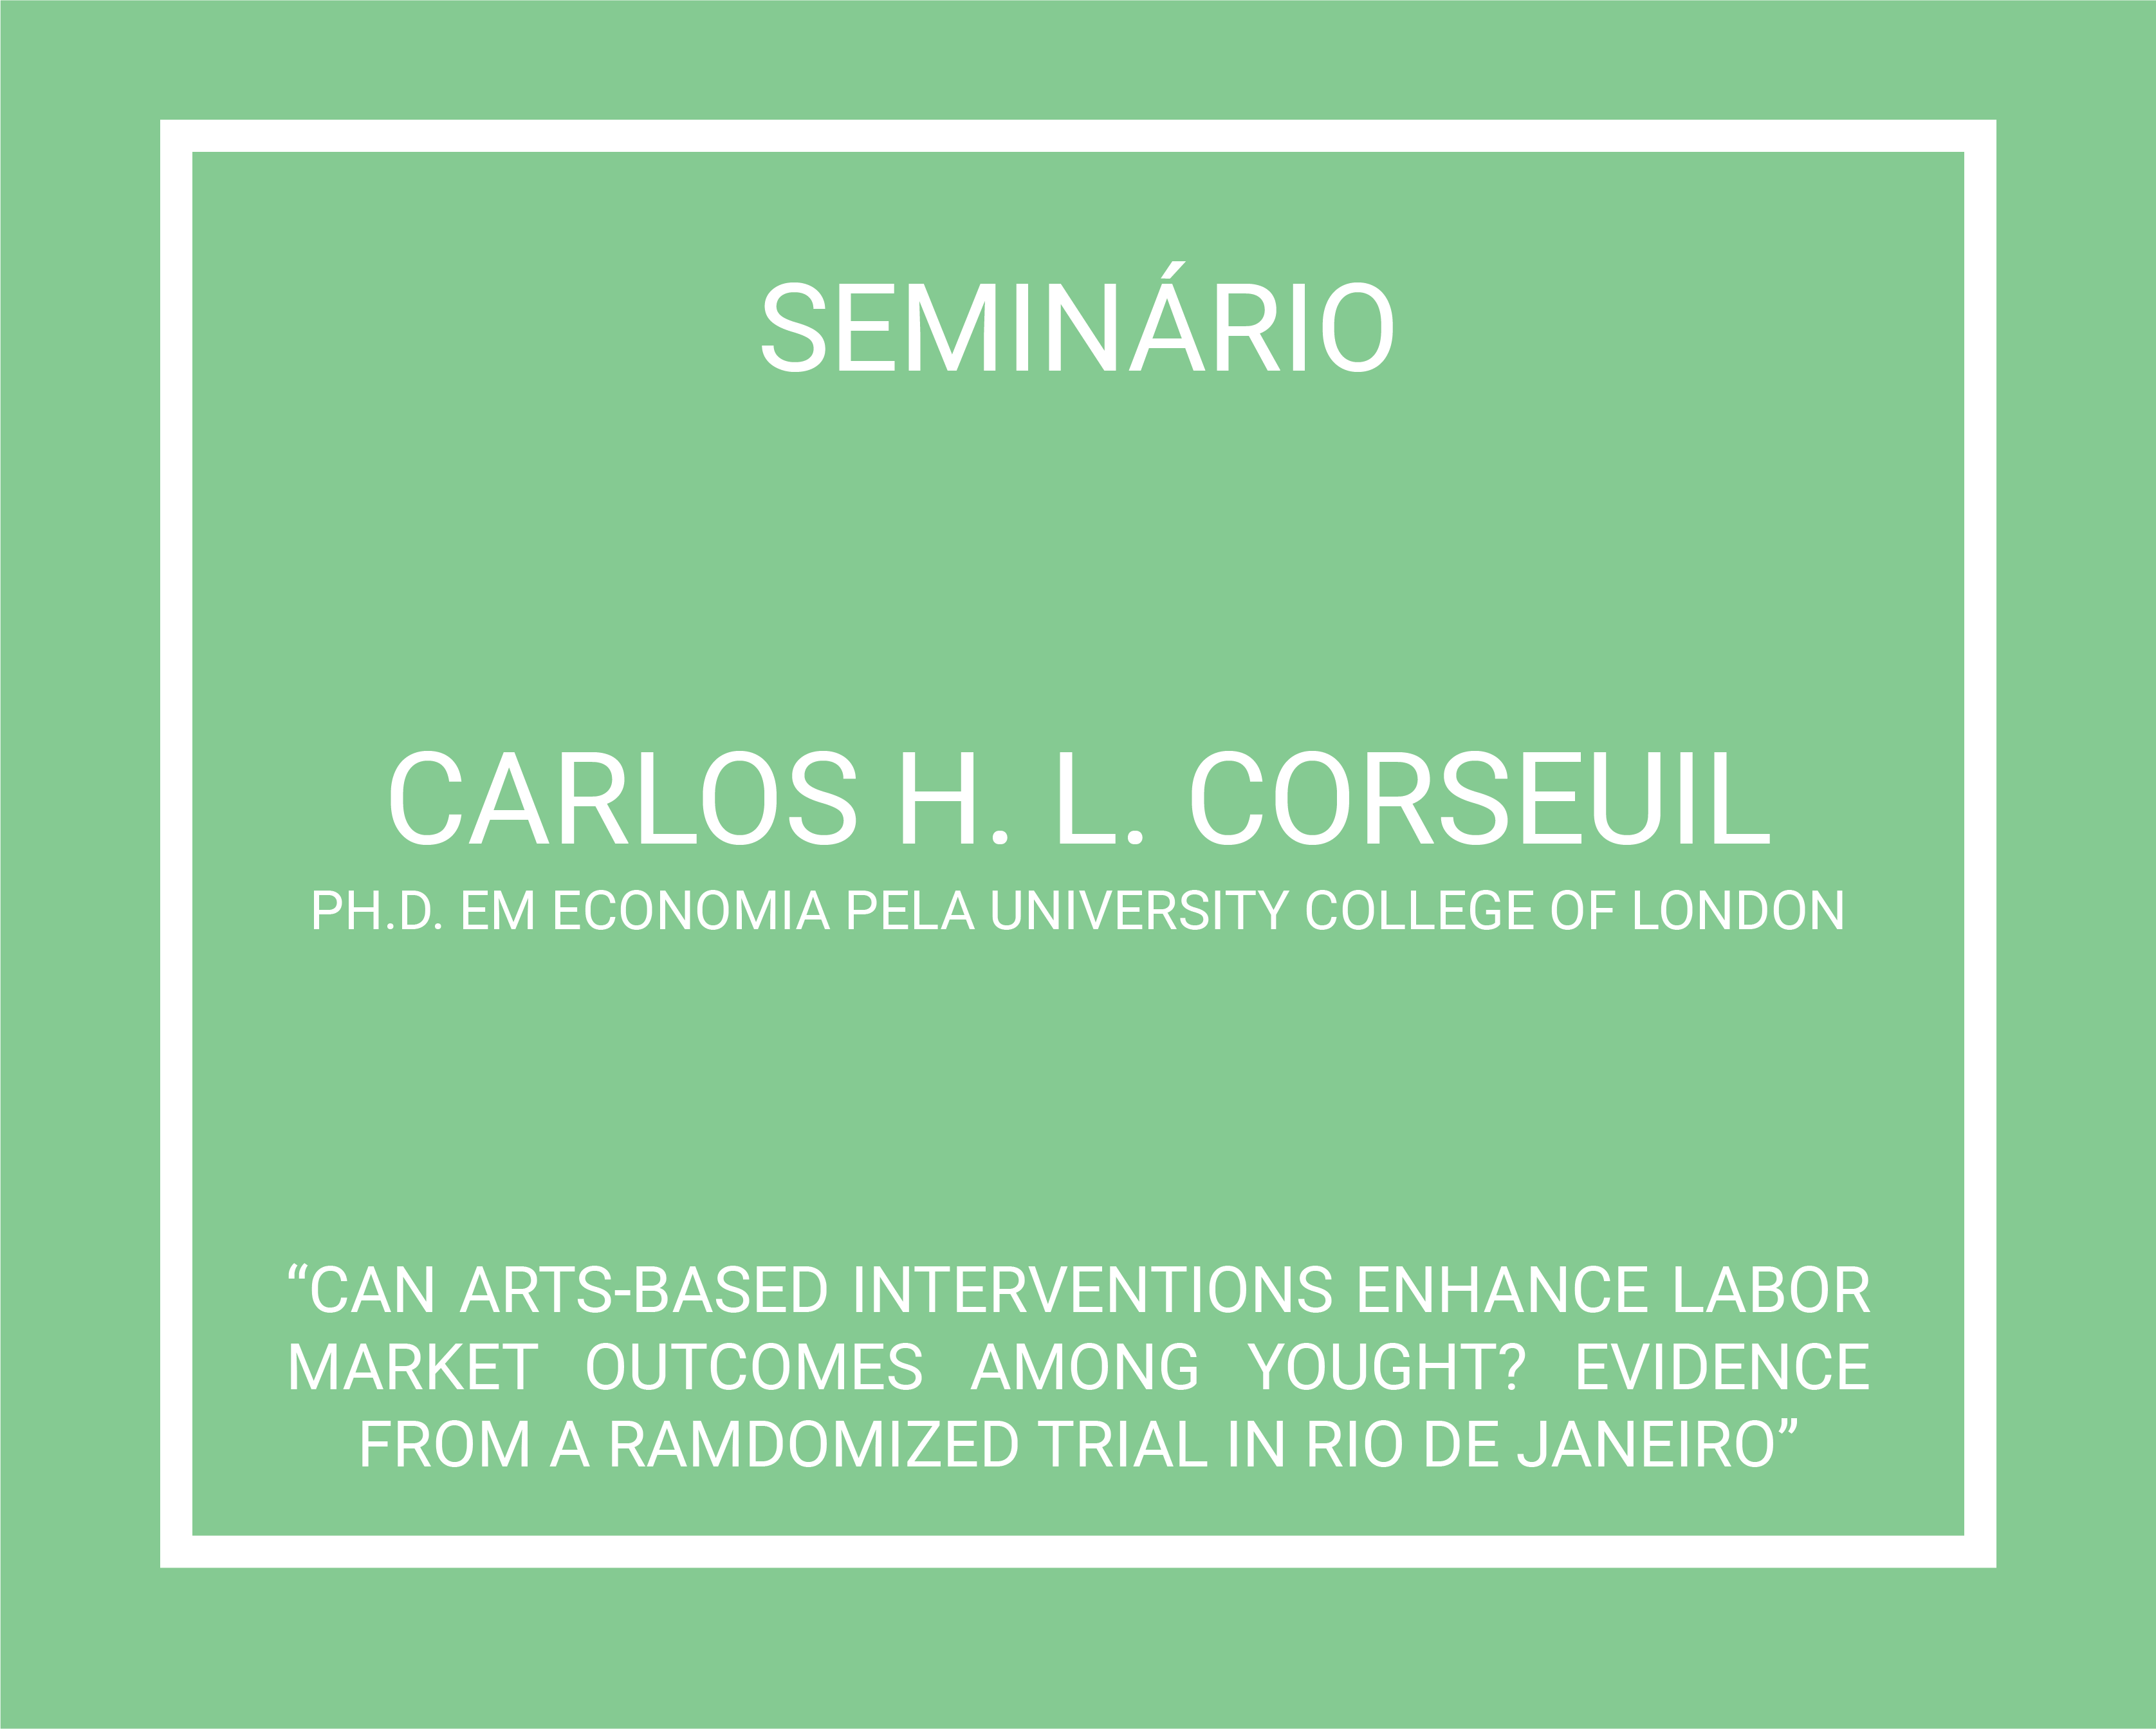 Carlos H L Corseuil